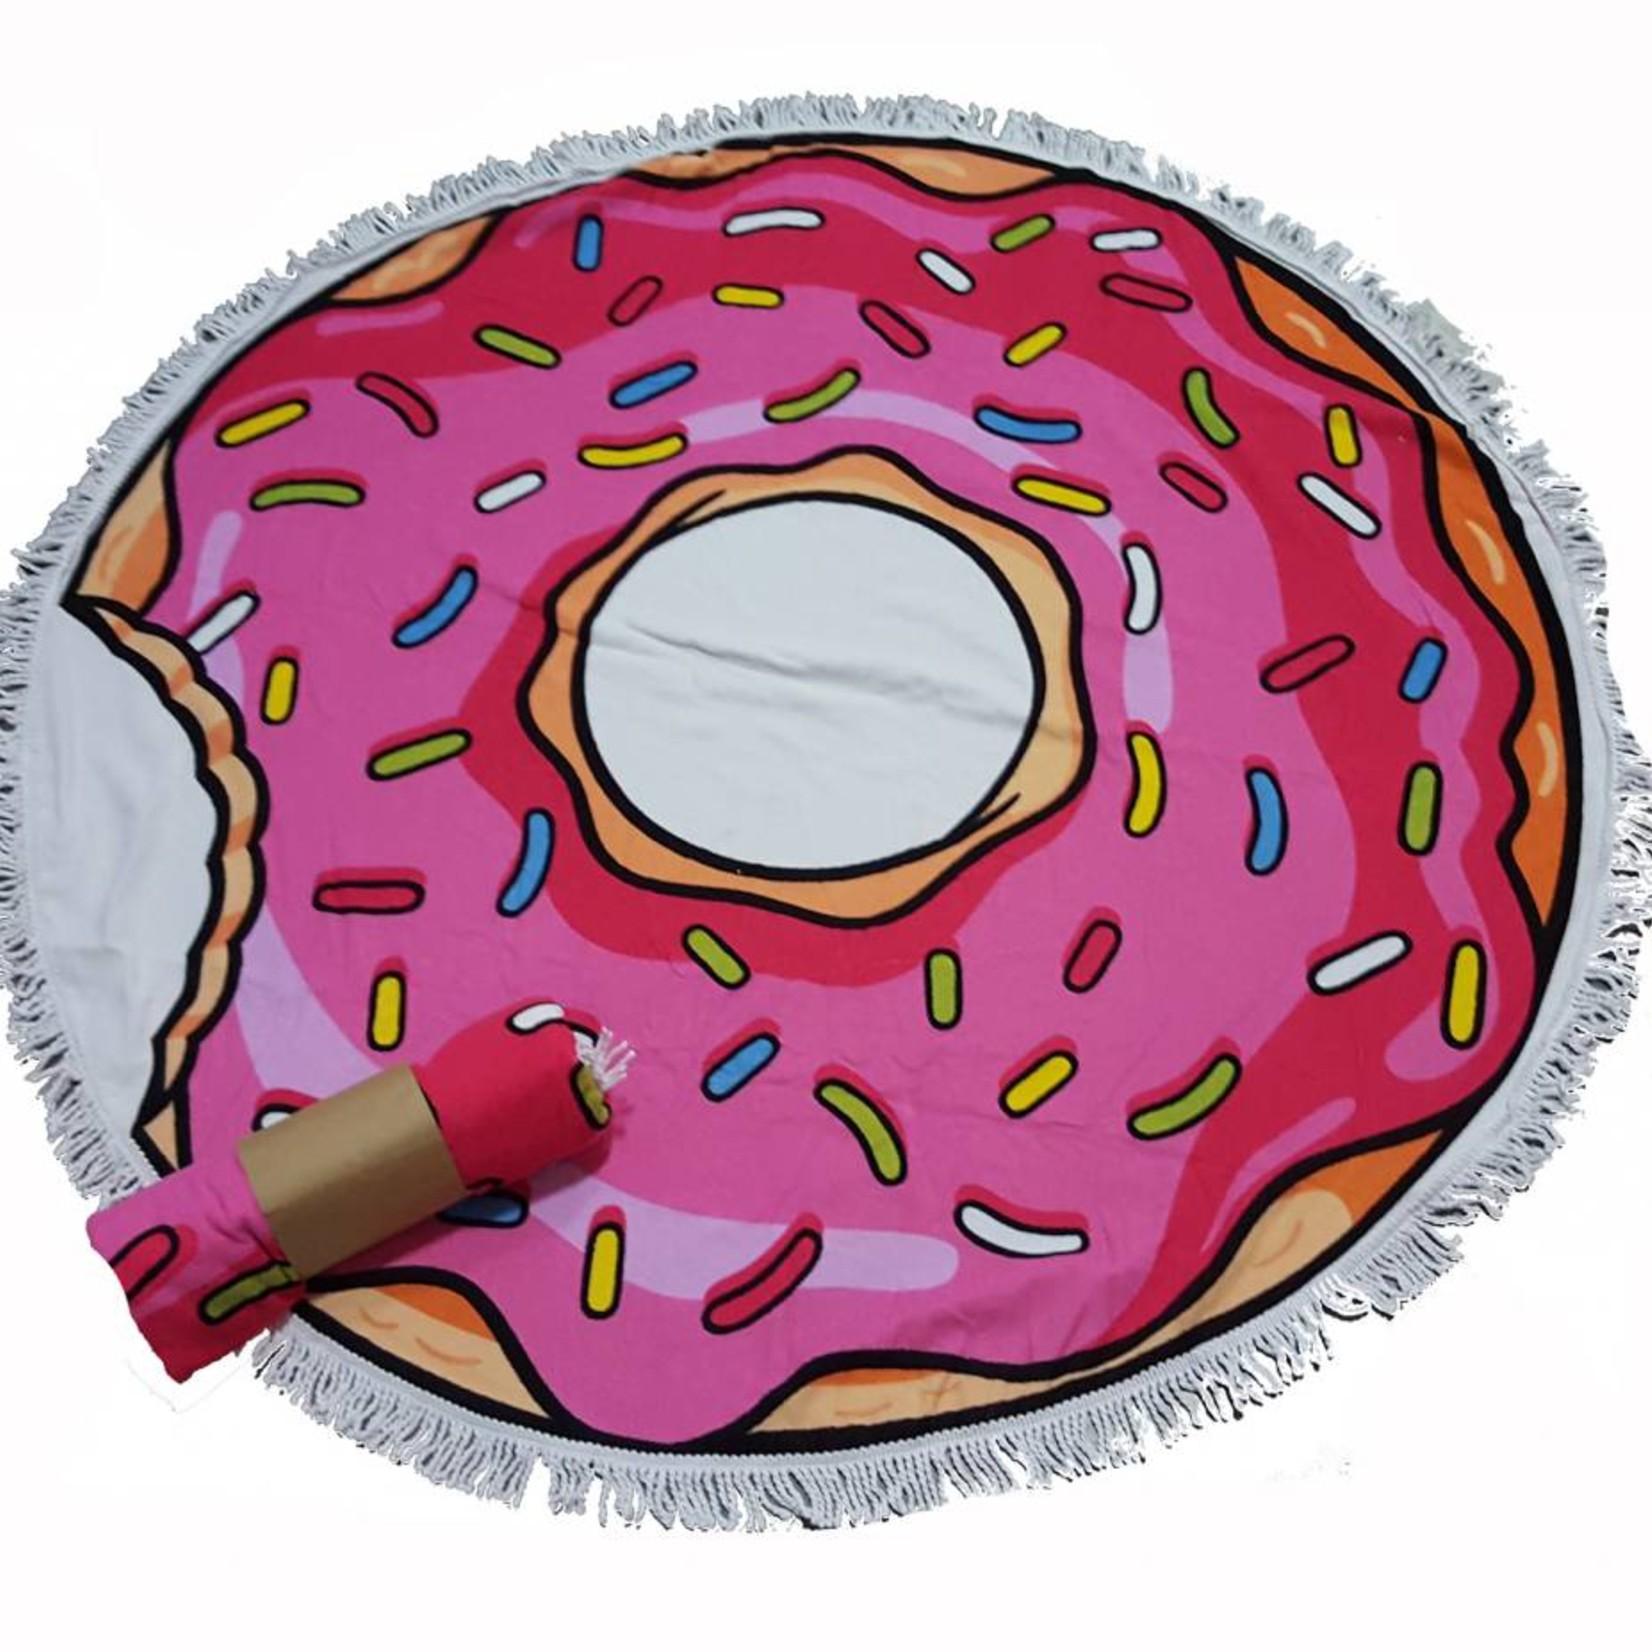 Roundie beach towel - rond strandlaken - badstof- boho - Ibiza handdoek bali stijl - Donut